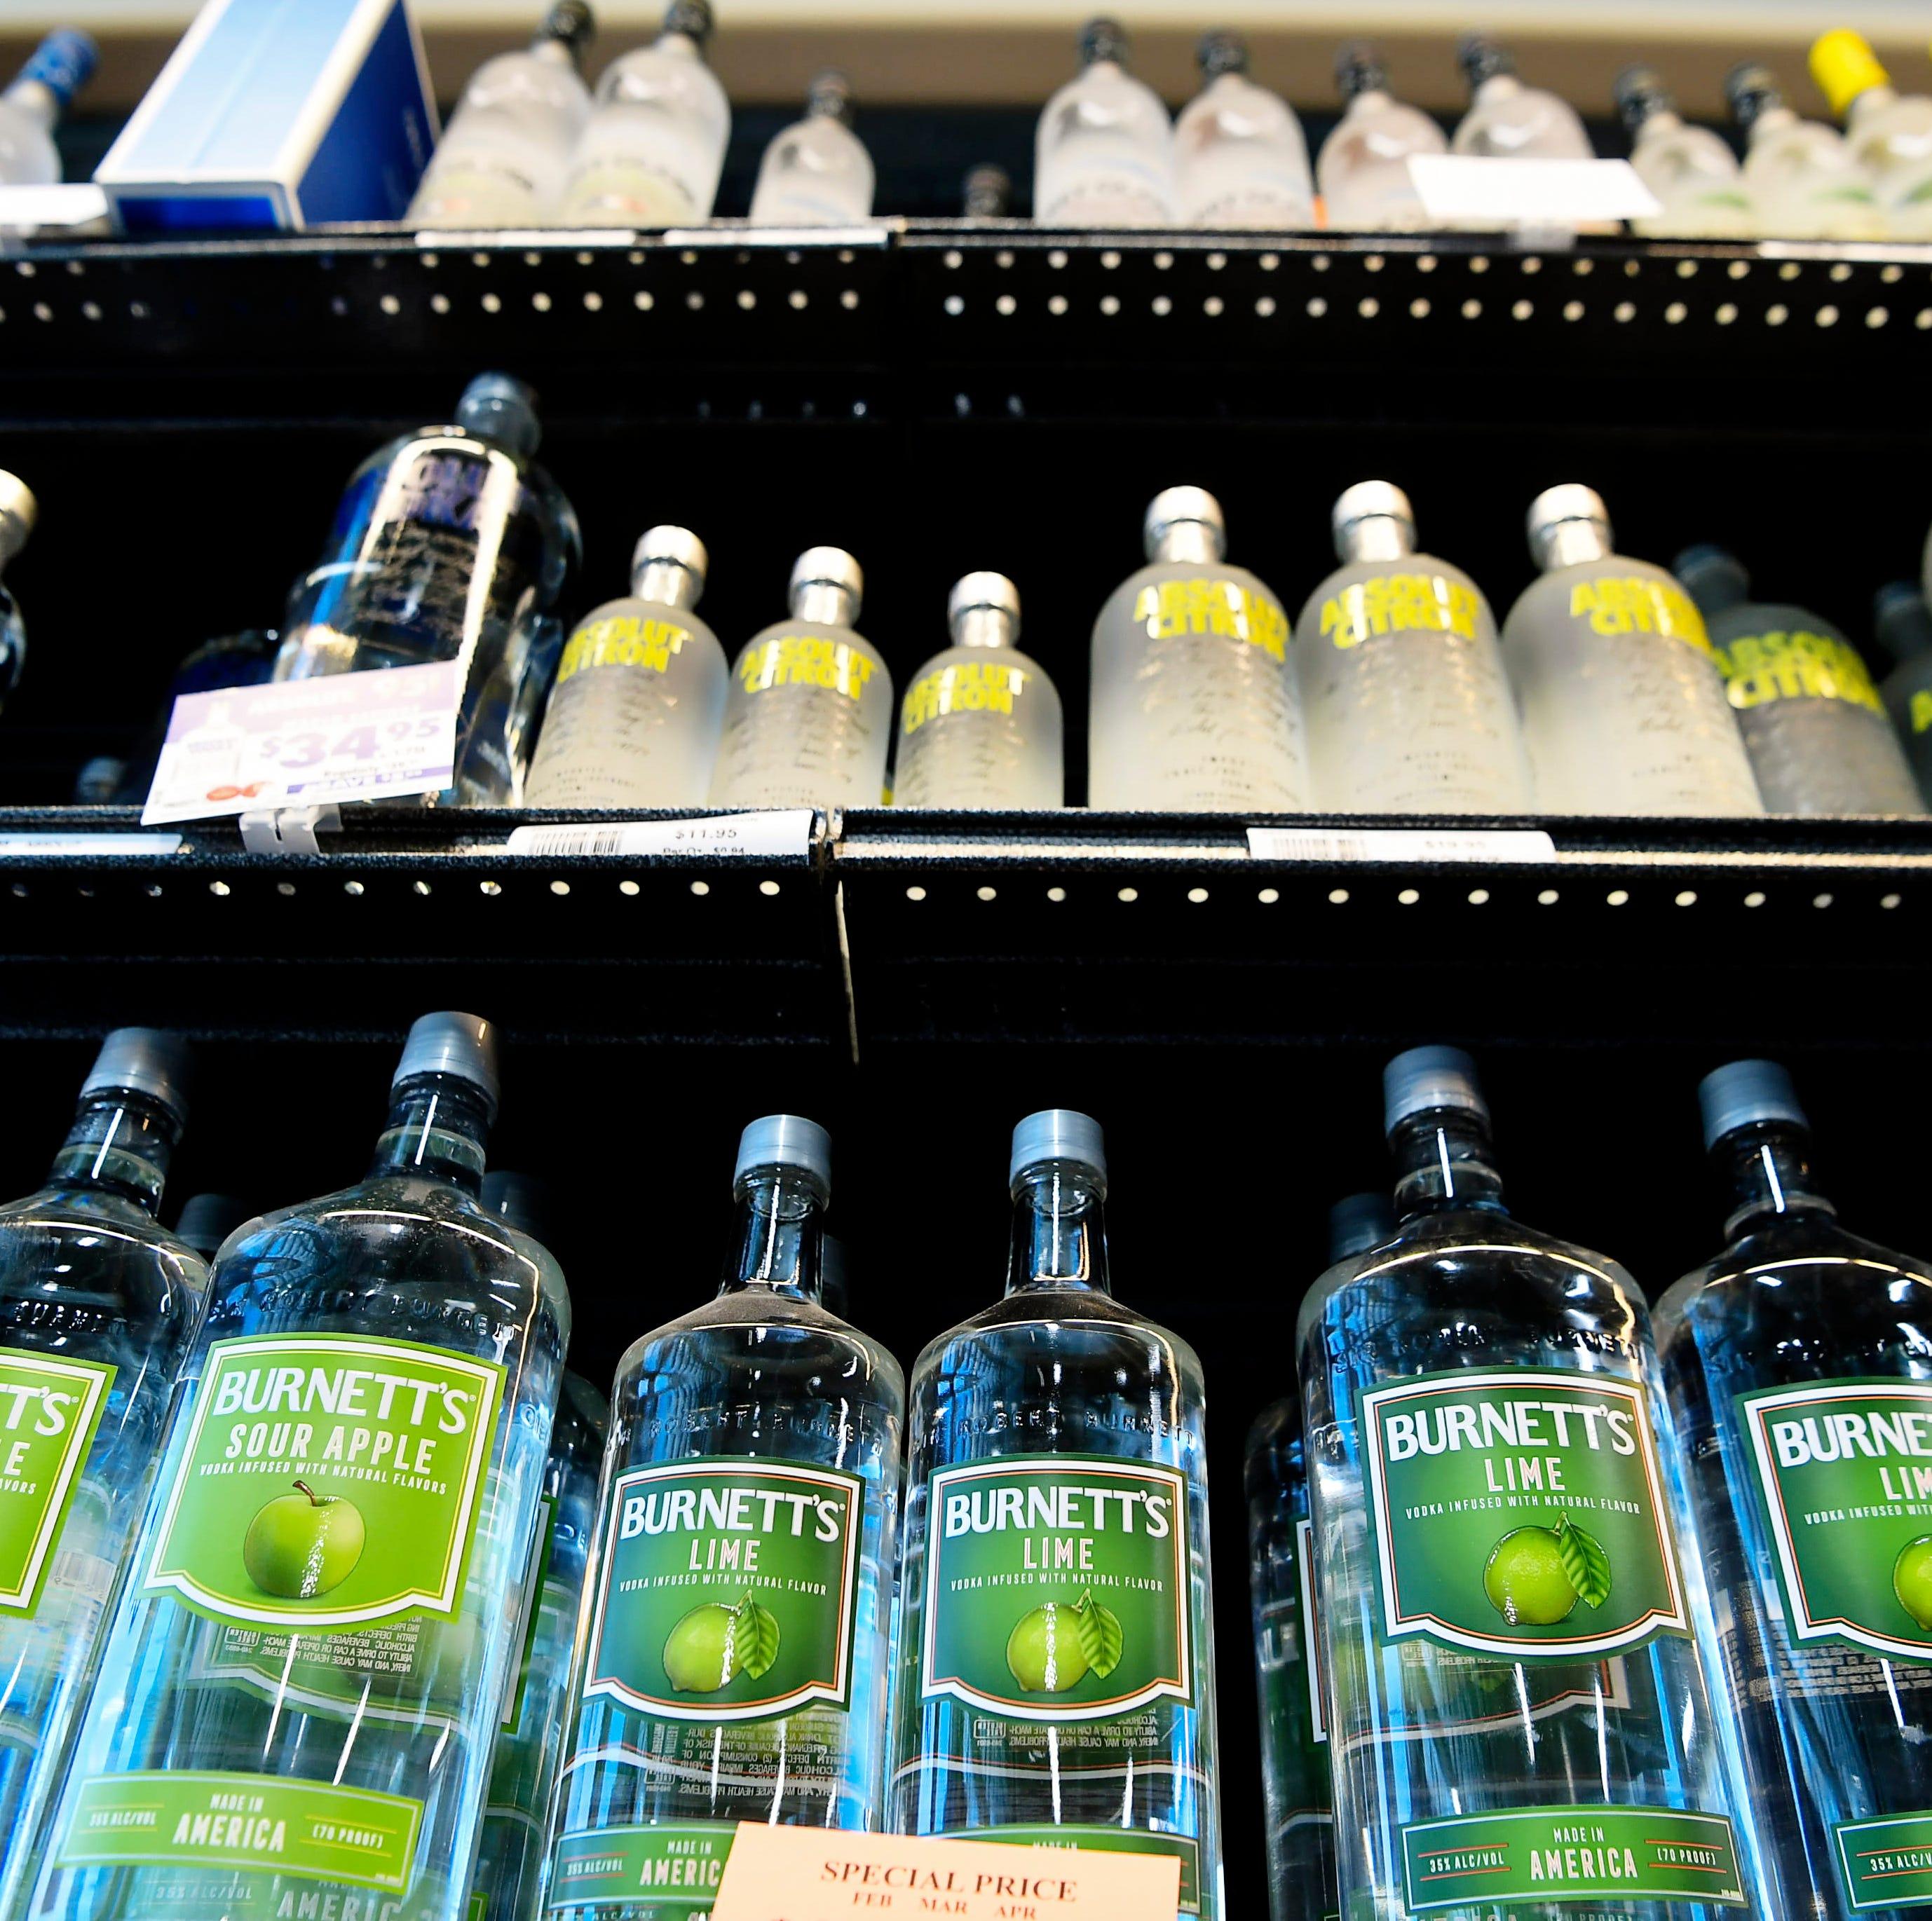 NC liquor privatization: More convenience? Higher prices? Public health problems?